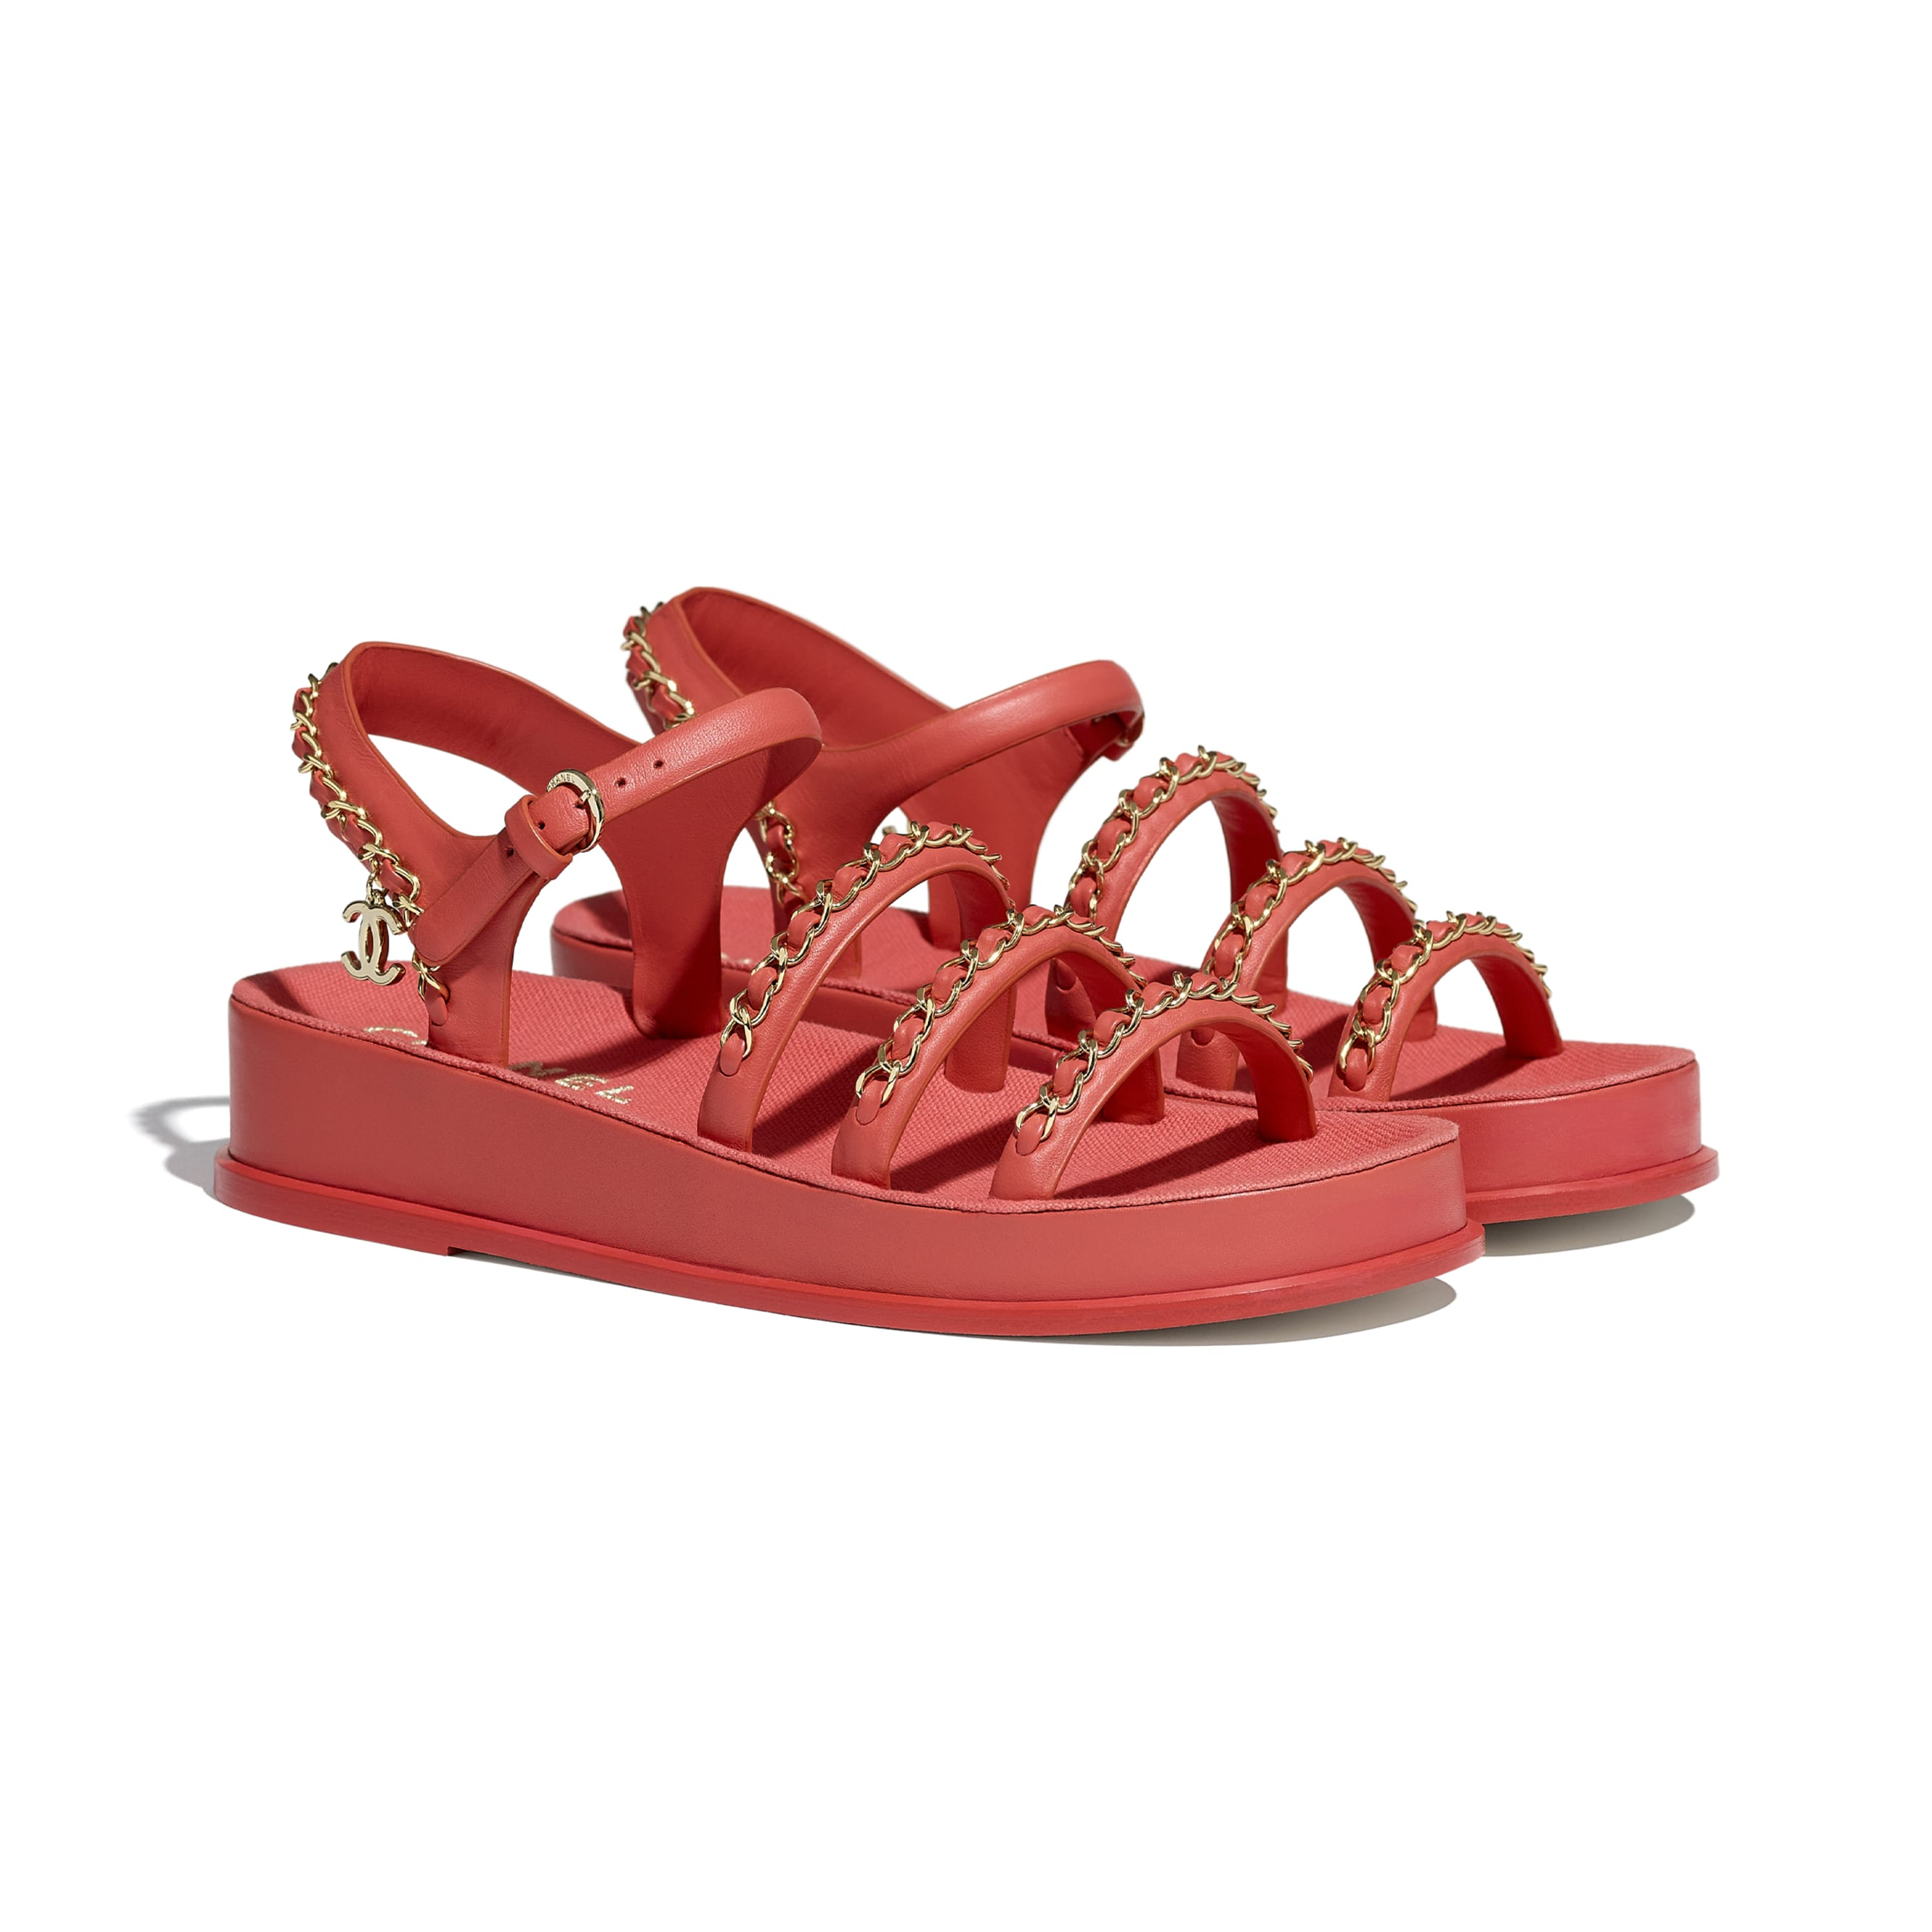 Sandals - Red - Calfskin - CHANEL - Alternative view - see standard sized version